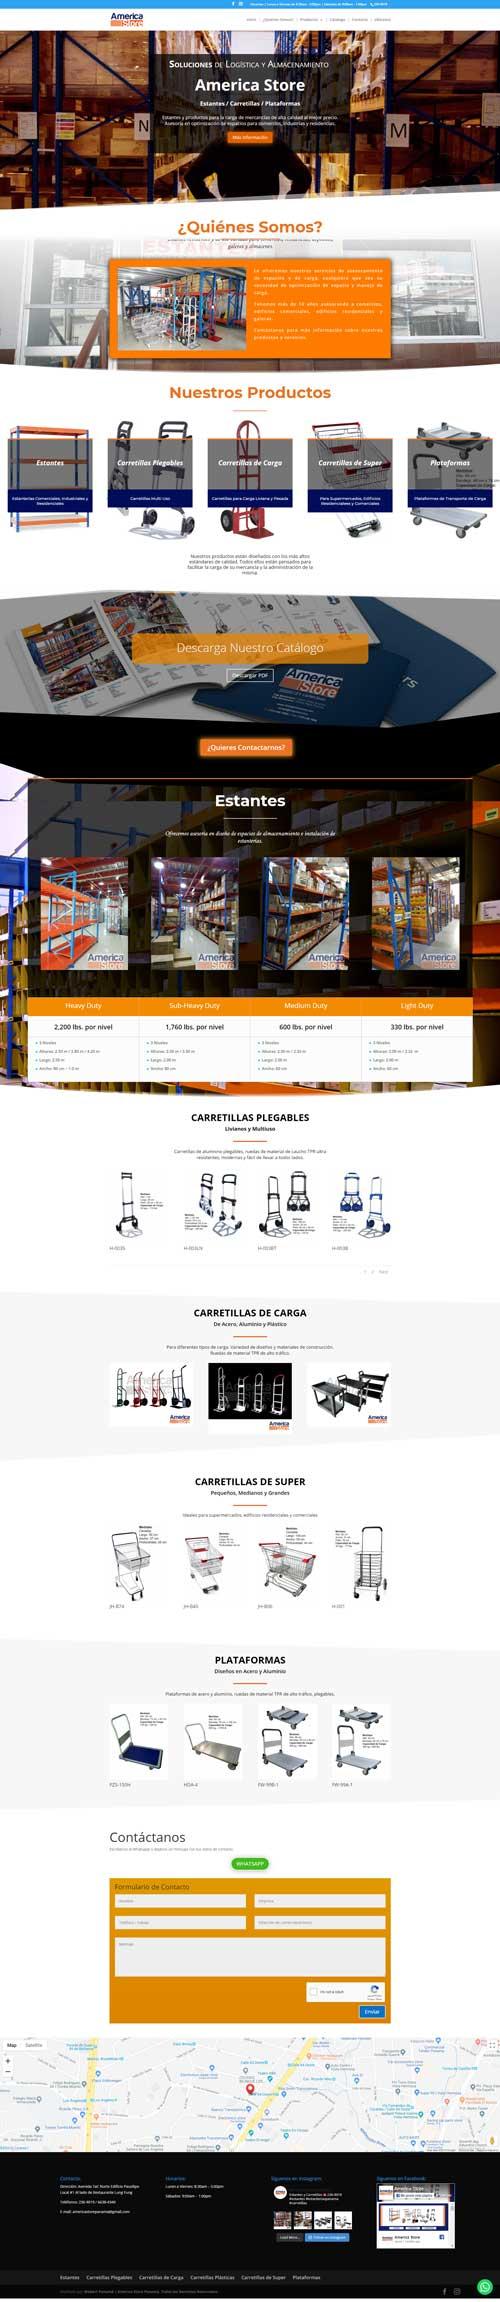 Comercio Electrónico - America Store